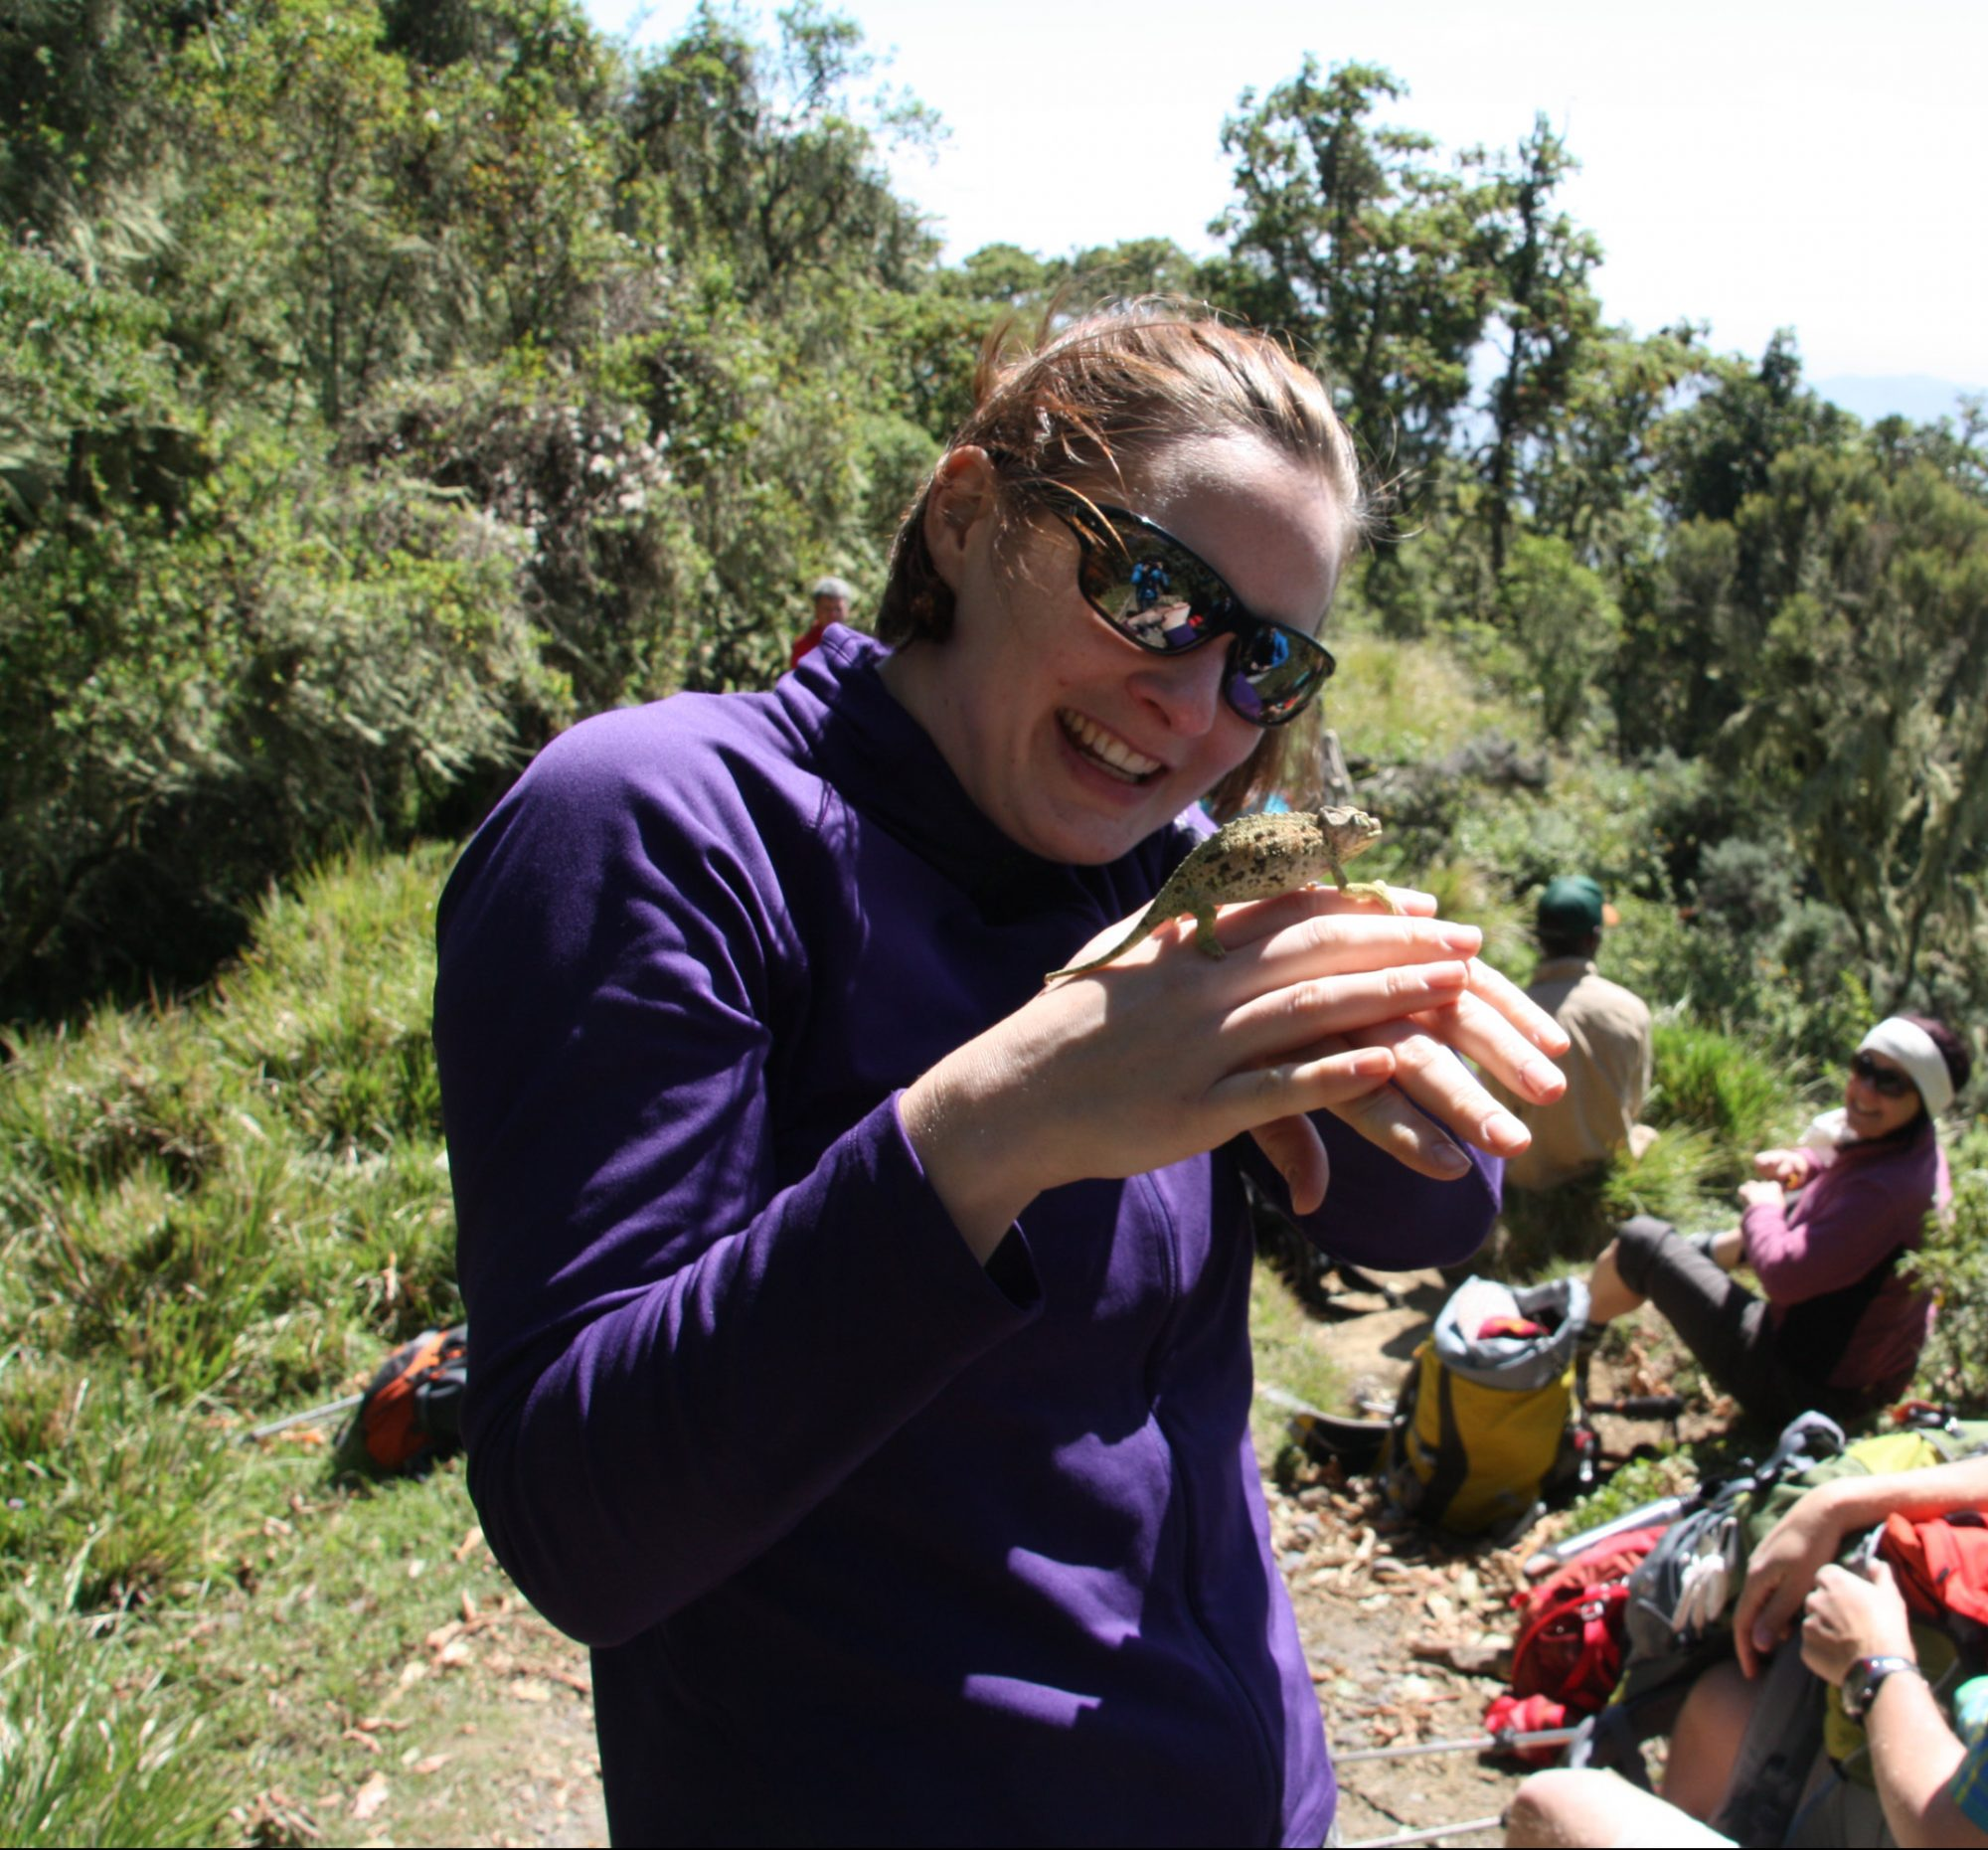 Mount Meru, Regenwald, Arusha Nationalpark, Tansania, Afrika